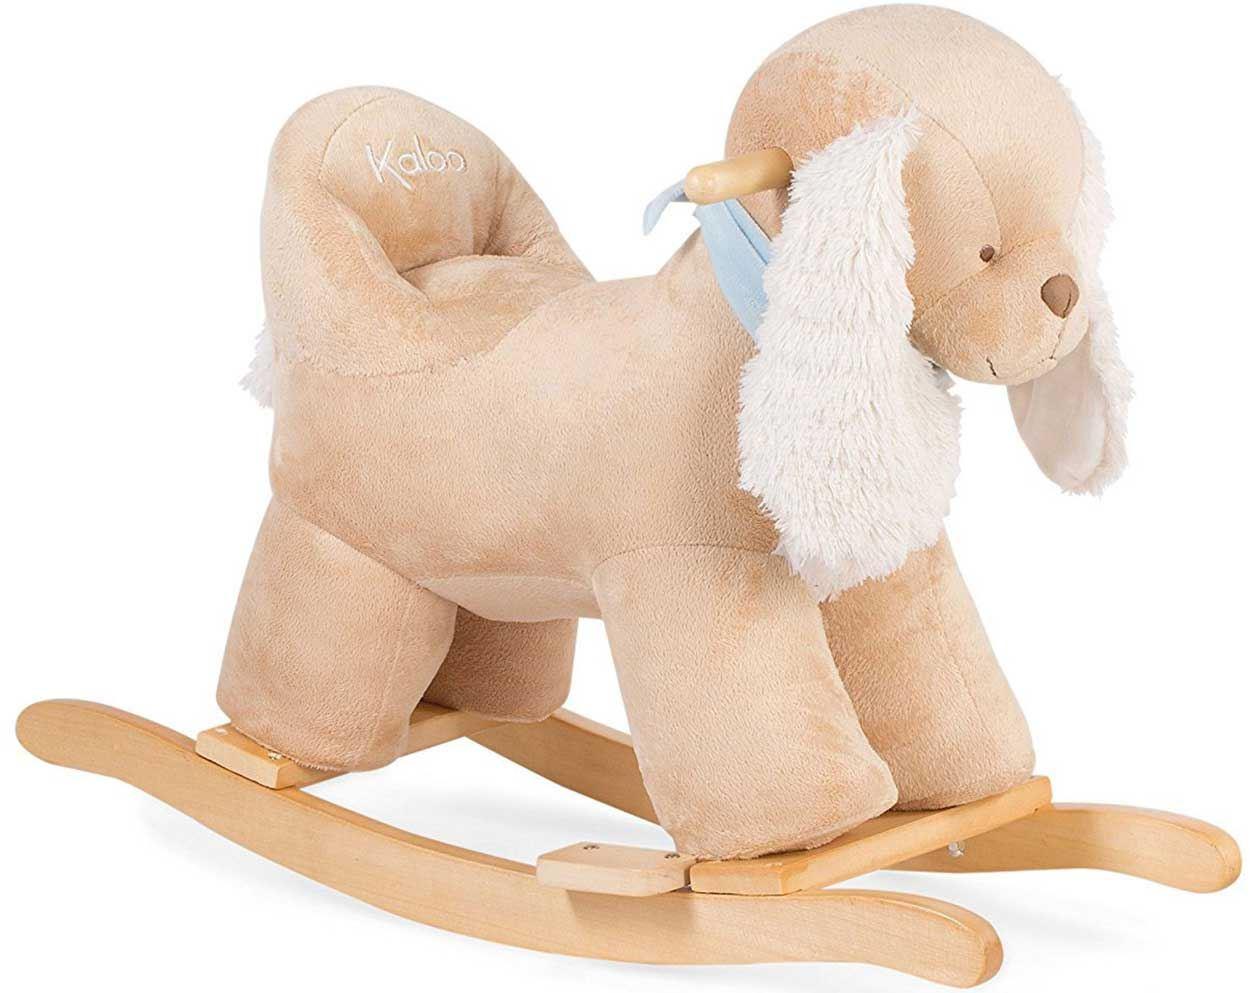 Kaloo-LES-AMIS-ROCKING-HORSE-Rocker-Dog-Donkey-Baby-Toddler-Plush-Toy-Gift-BNIB